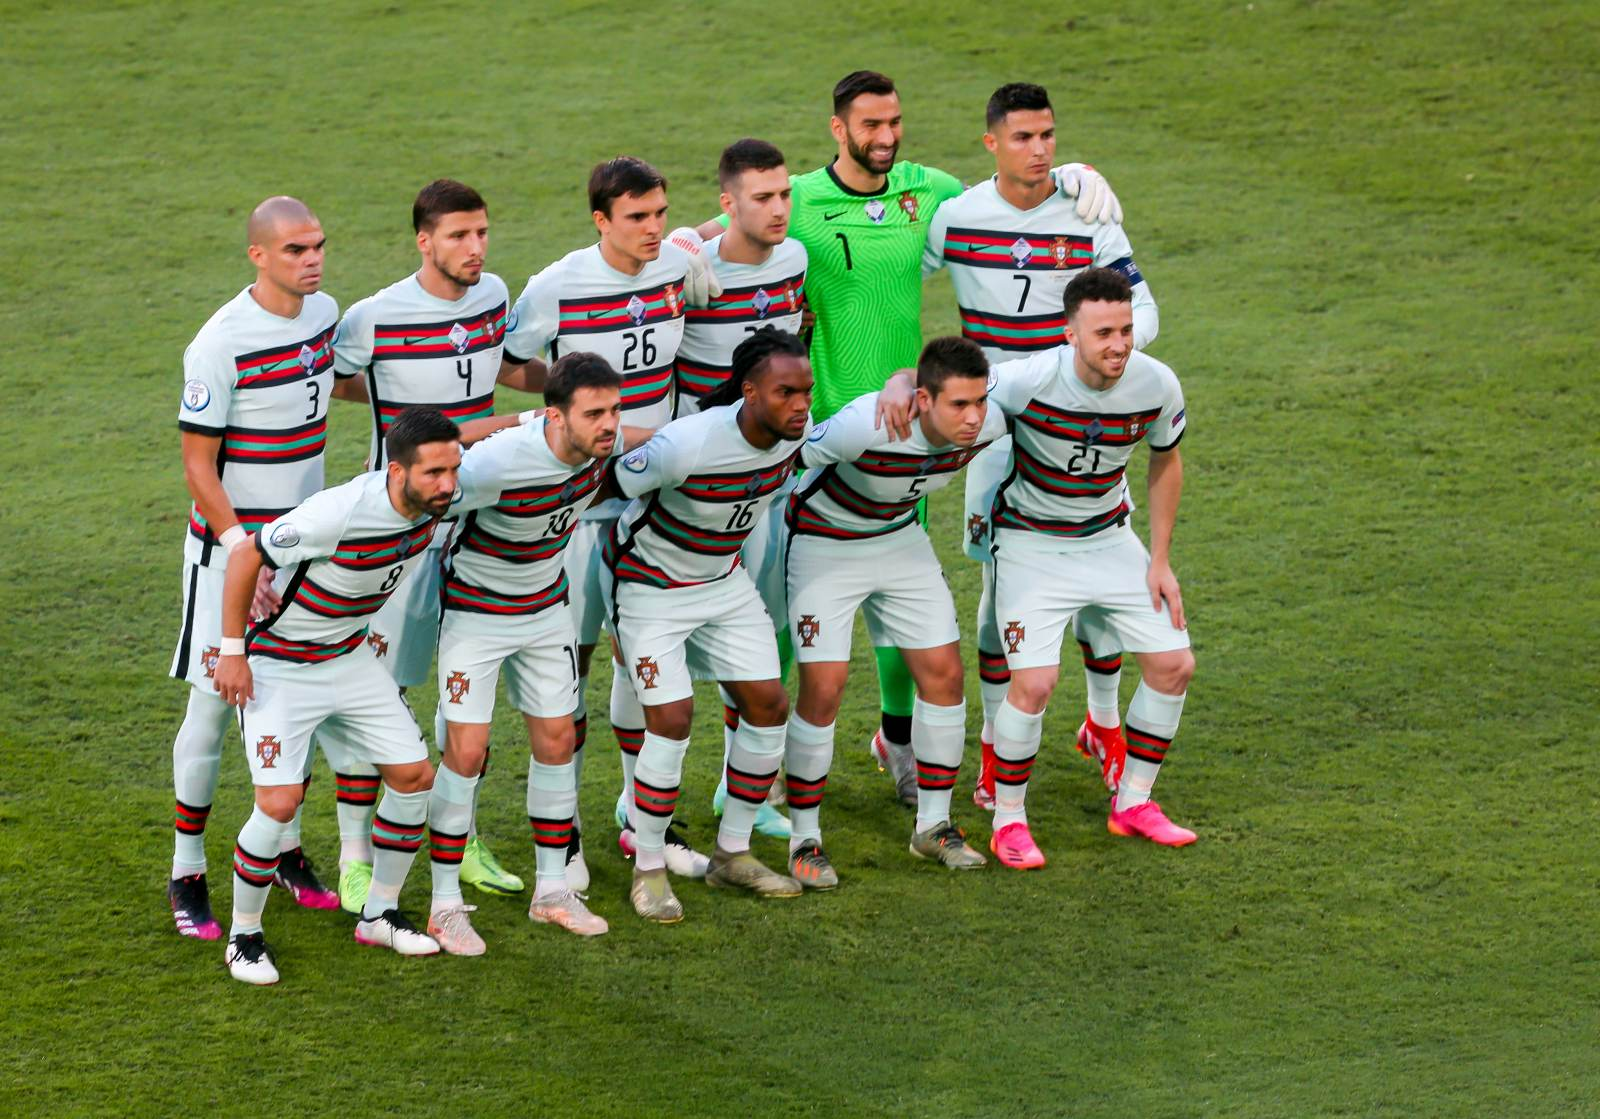 Катар - Португалия - 1:3 (завершён)